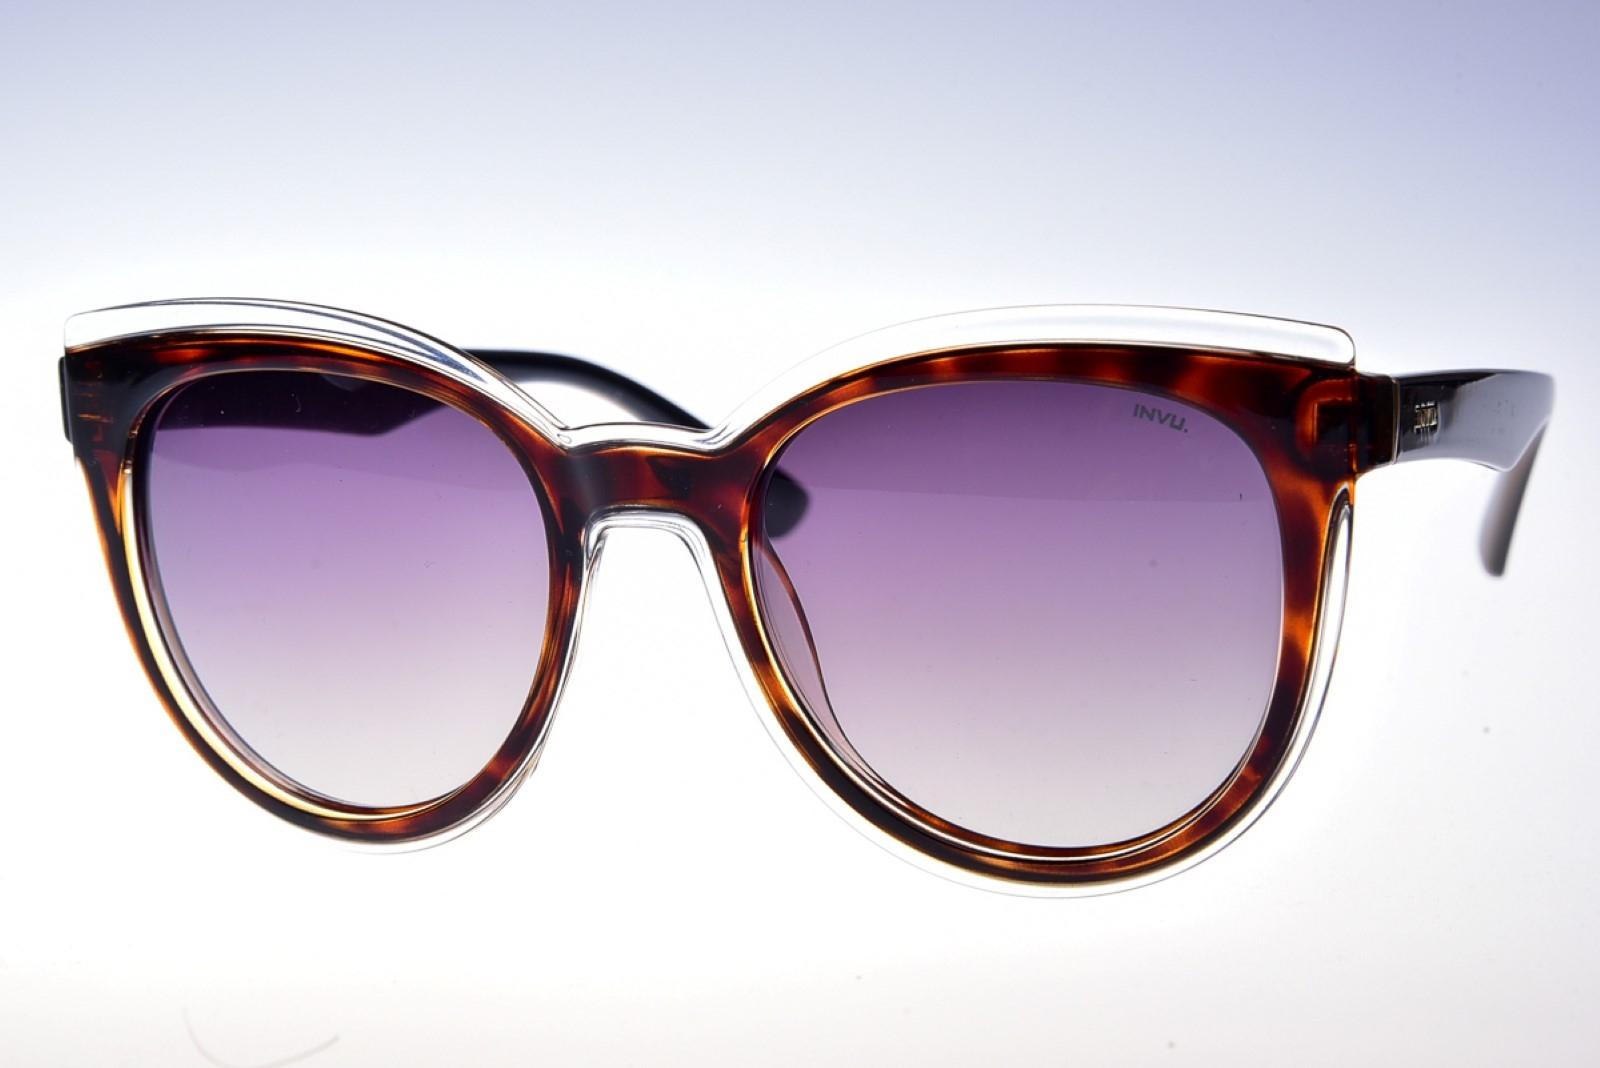 4a8f8d301 INVU. Trend T2806A - Dámske, pánske a detské slnečné okuliare ...